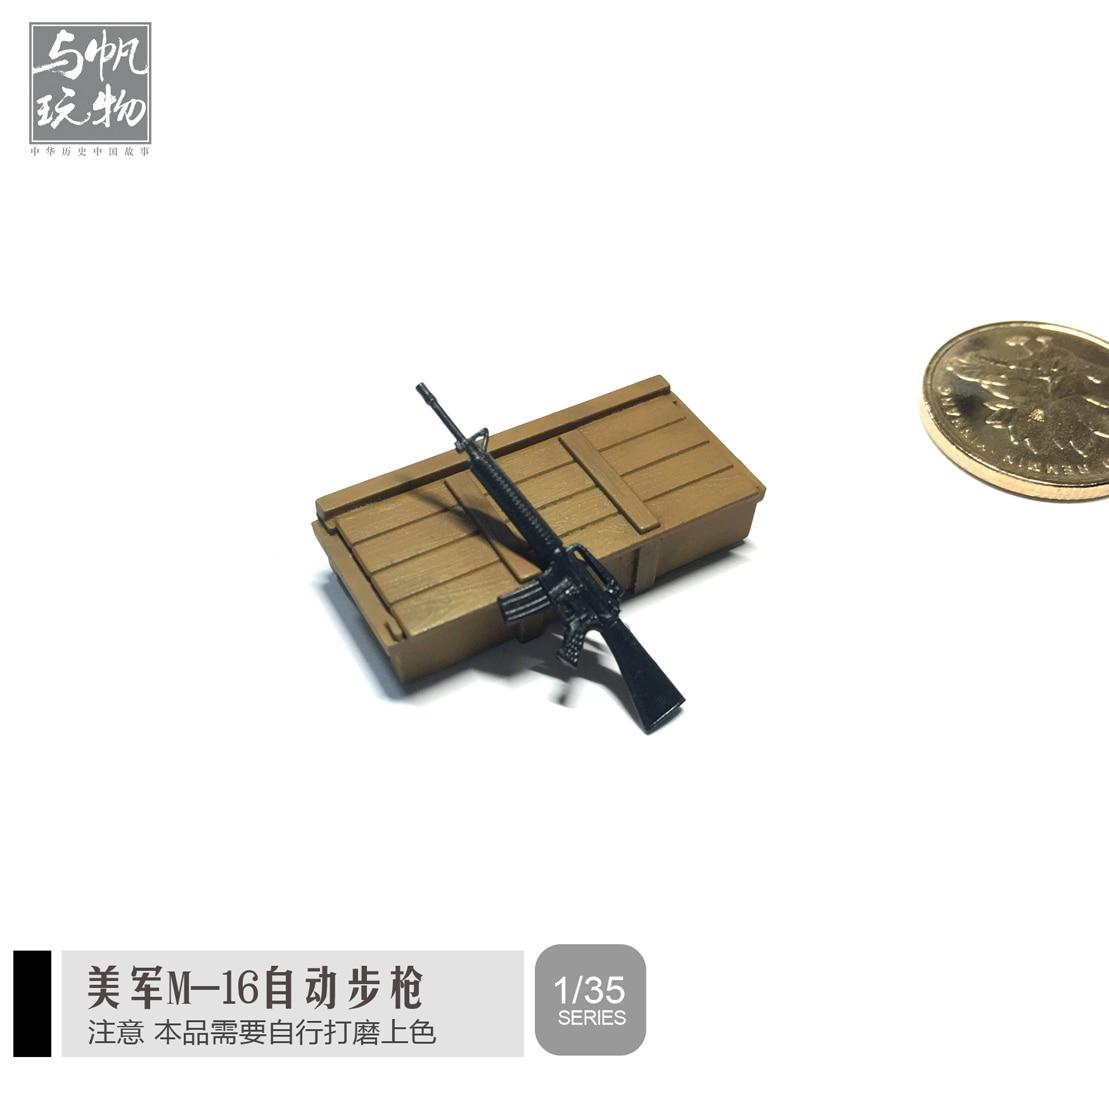 1:35 Resin US Army M-16 Model Gun Weapon Model Colorless 2-3CM